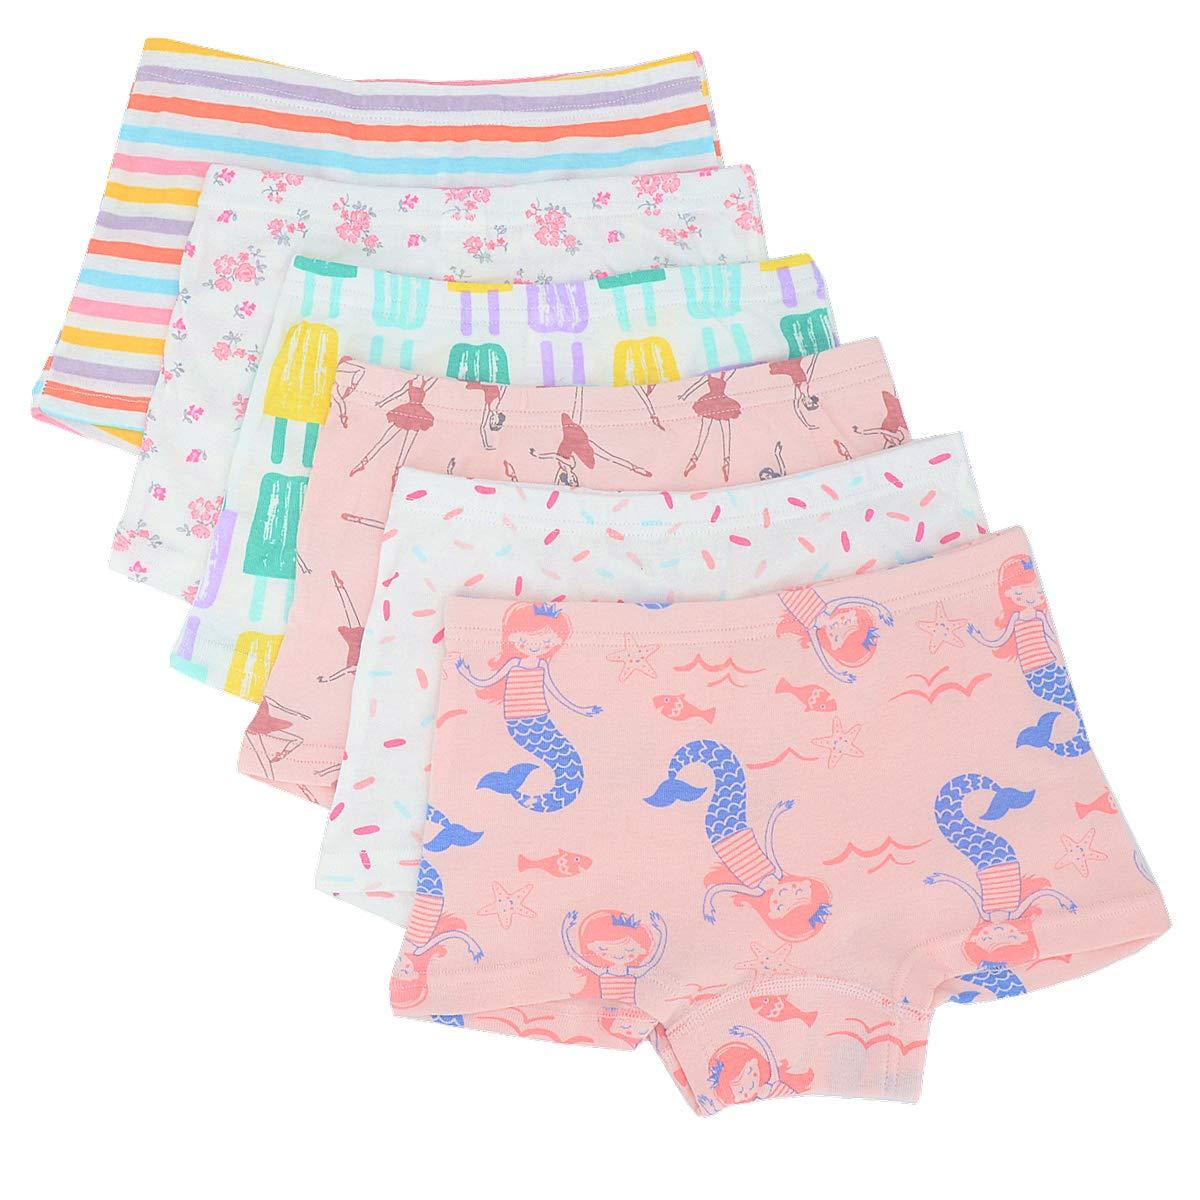 Toddler Little Girls Boyshort Panties Kids Cotton Boxer Briefs Underwear Set 6 Pack